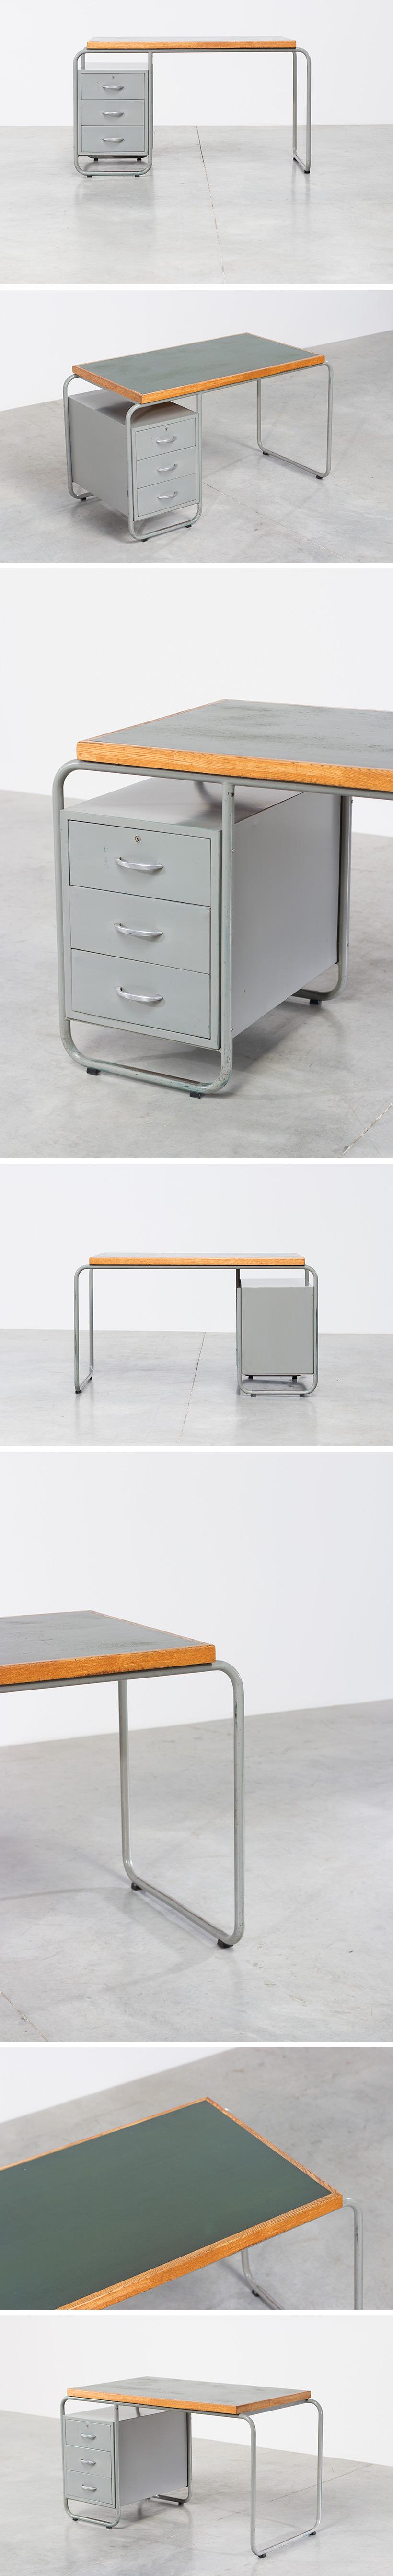 Bauhaus industrial tubular steel and linoleum desk Large